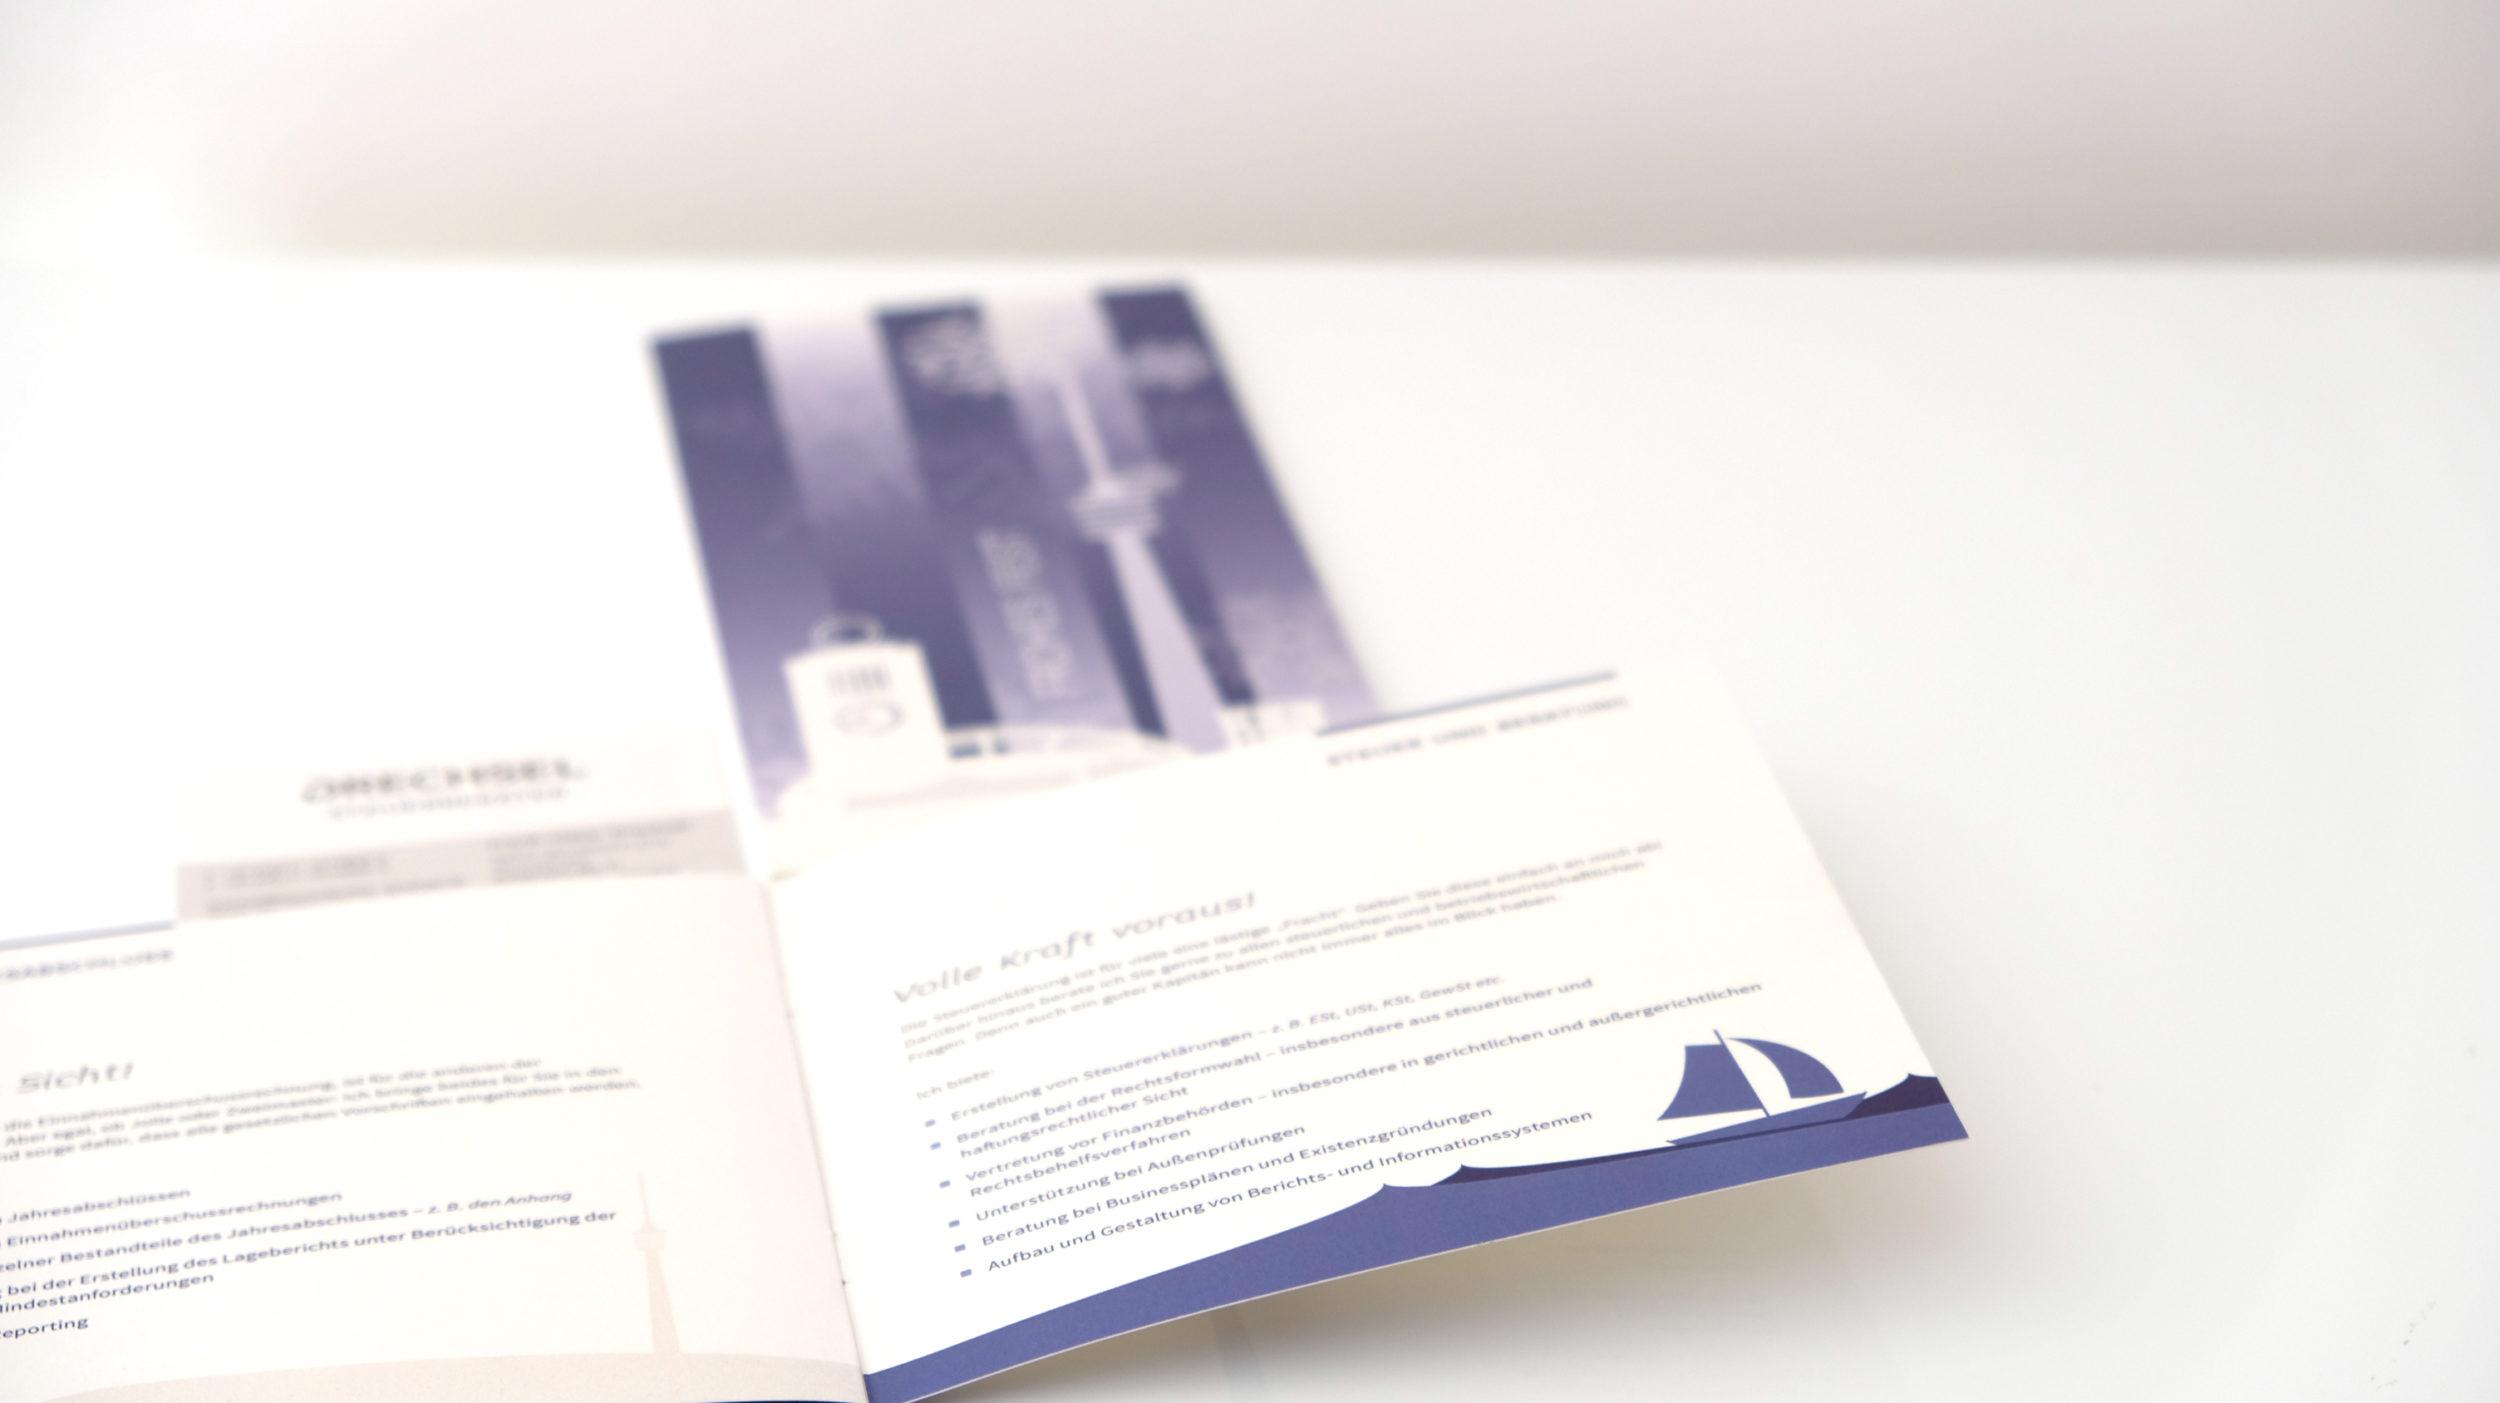 Steuerberater Drechsel Broschuere